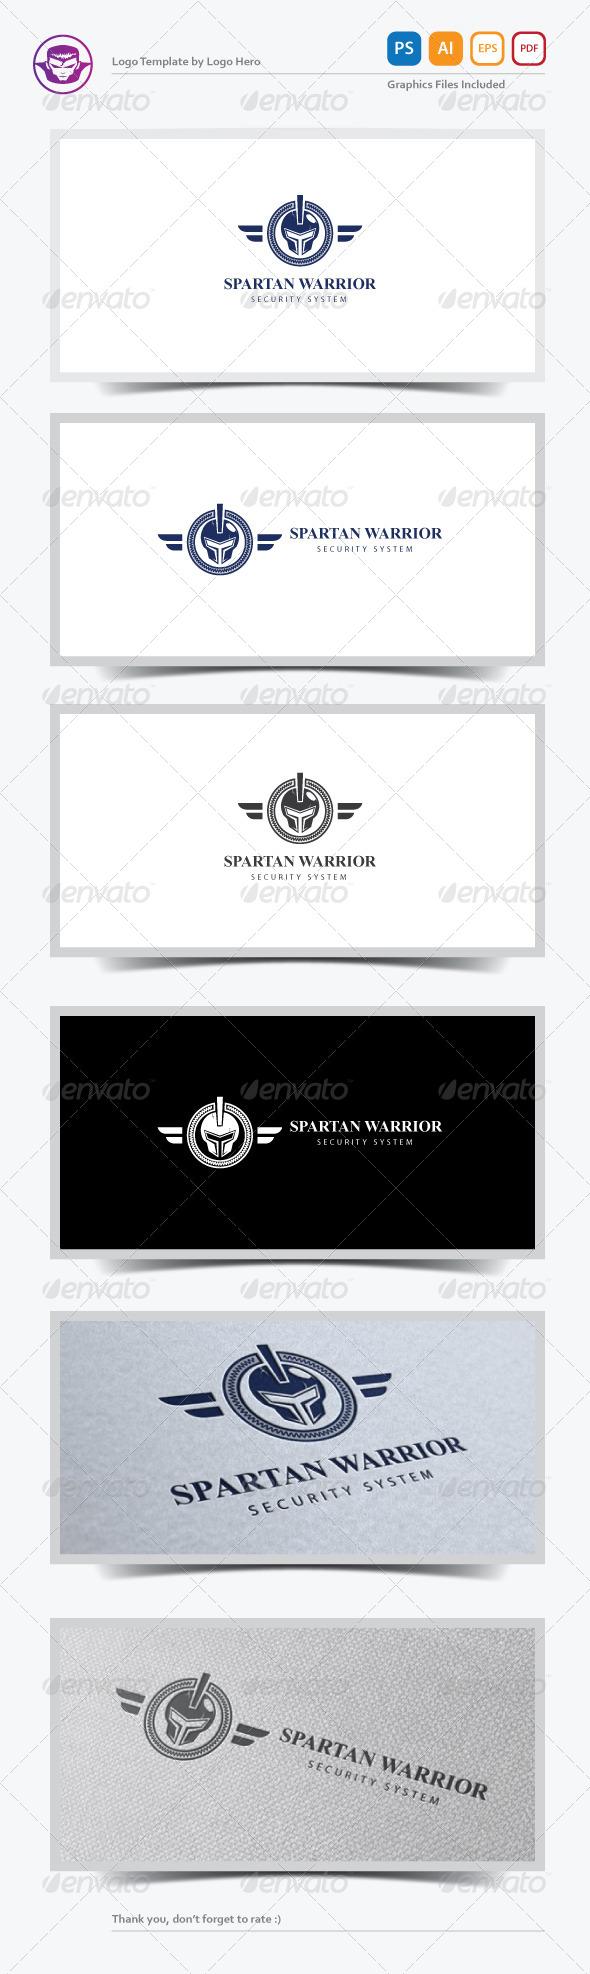 GraphicRiver Spartan Warrior Logo Template 7410643